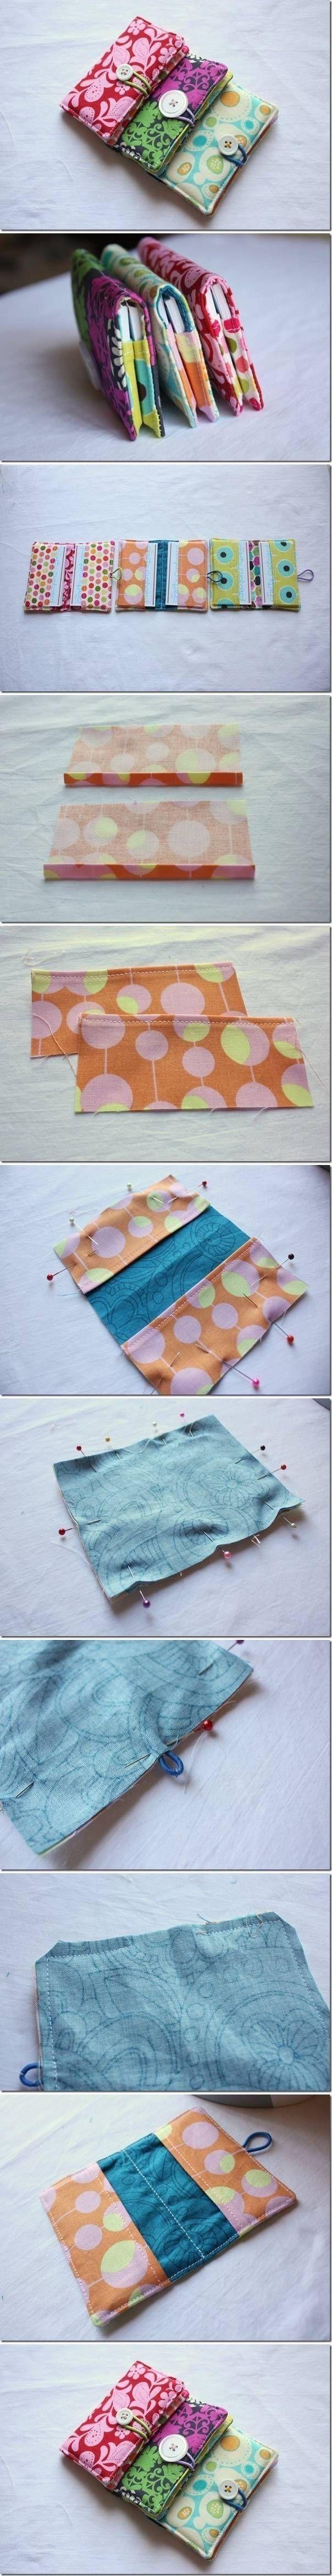 DIY Sew Business Card Holder Pictures, Photos, and Images for Facebook, Tumblr, Pinterest, and Twitter #handbagdiy #diyhandbag